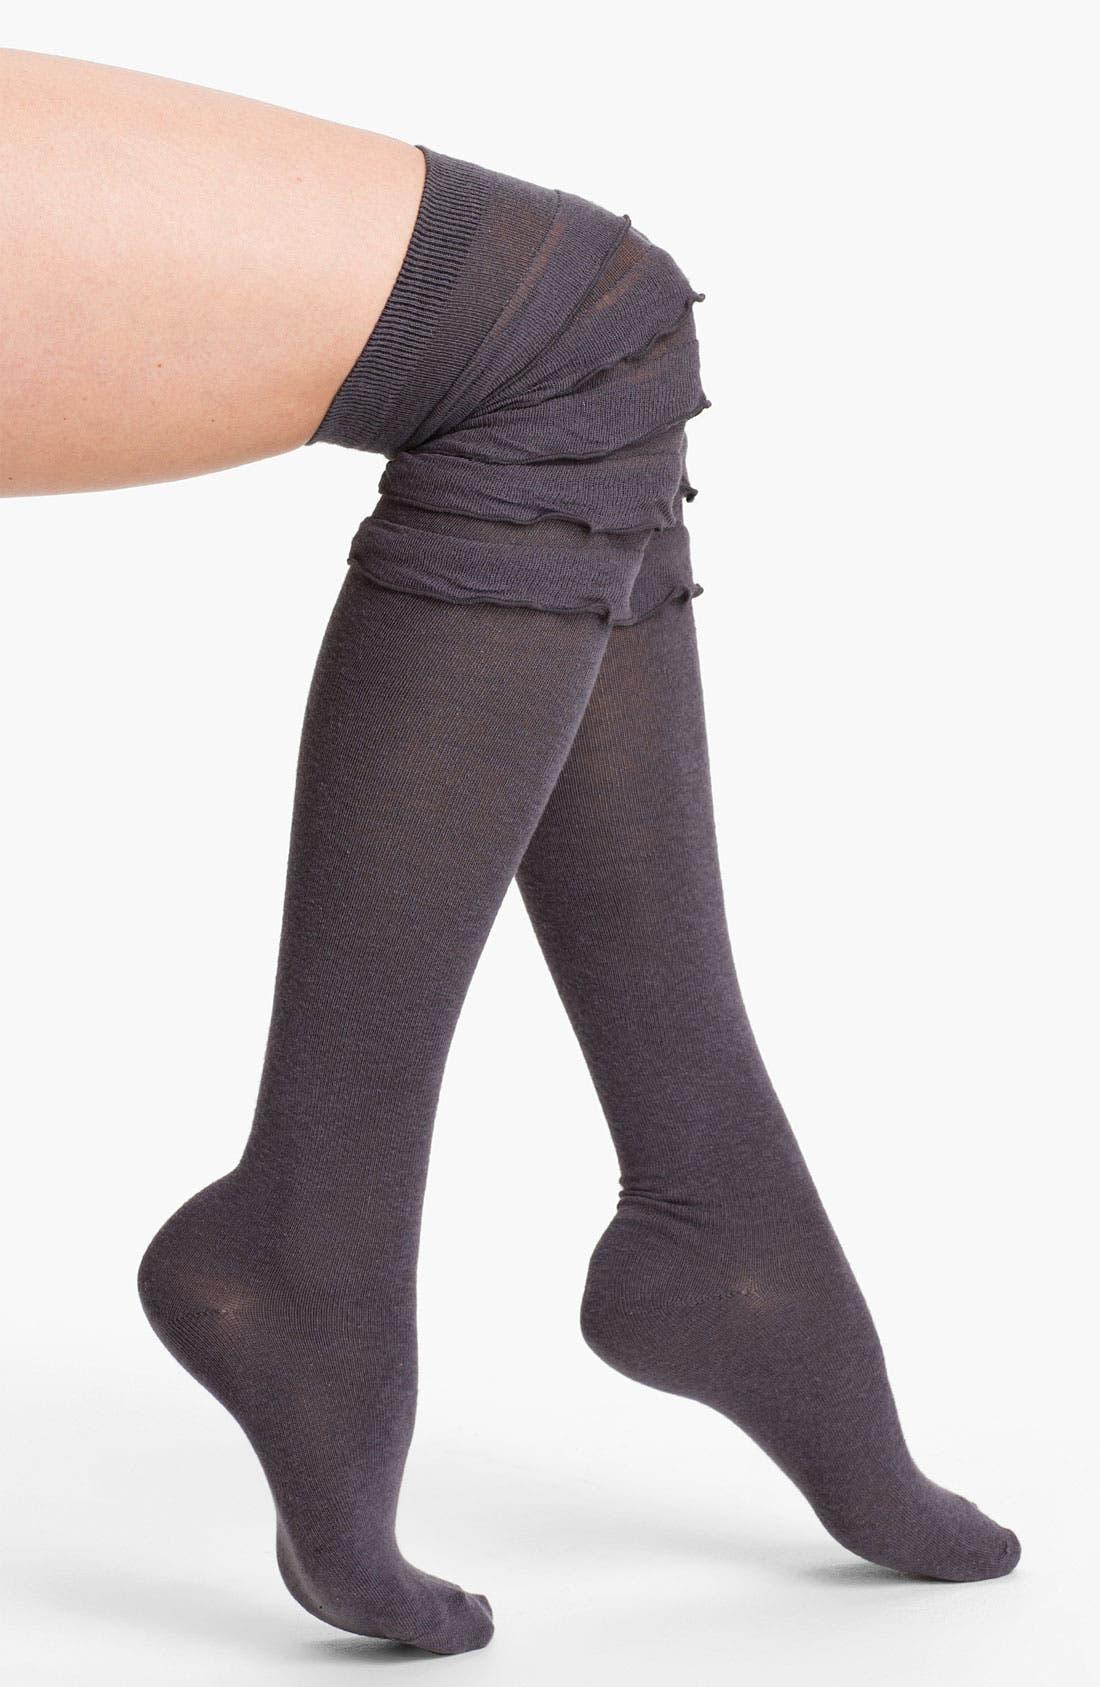 Main Image - Free People Ruffle Over-the-Knee Socks